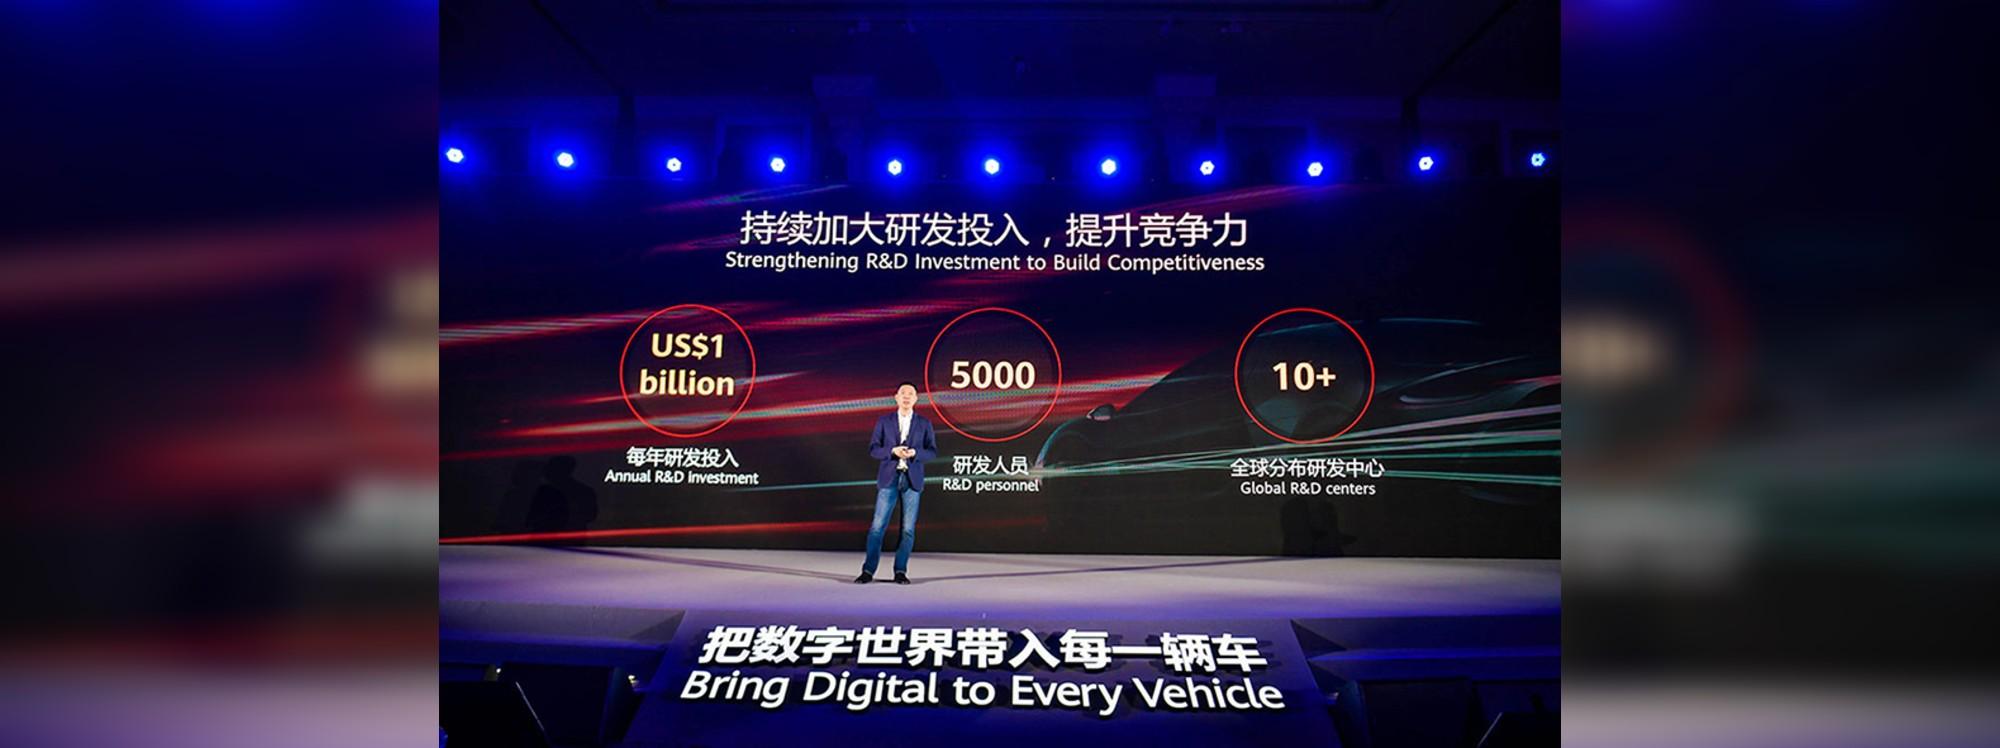 Huawei presenta módulos HI para autos inteligentes